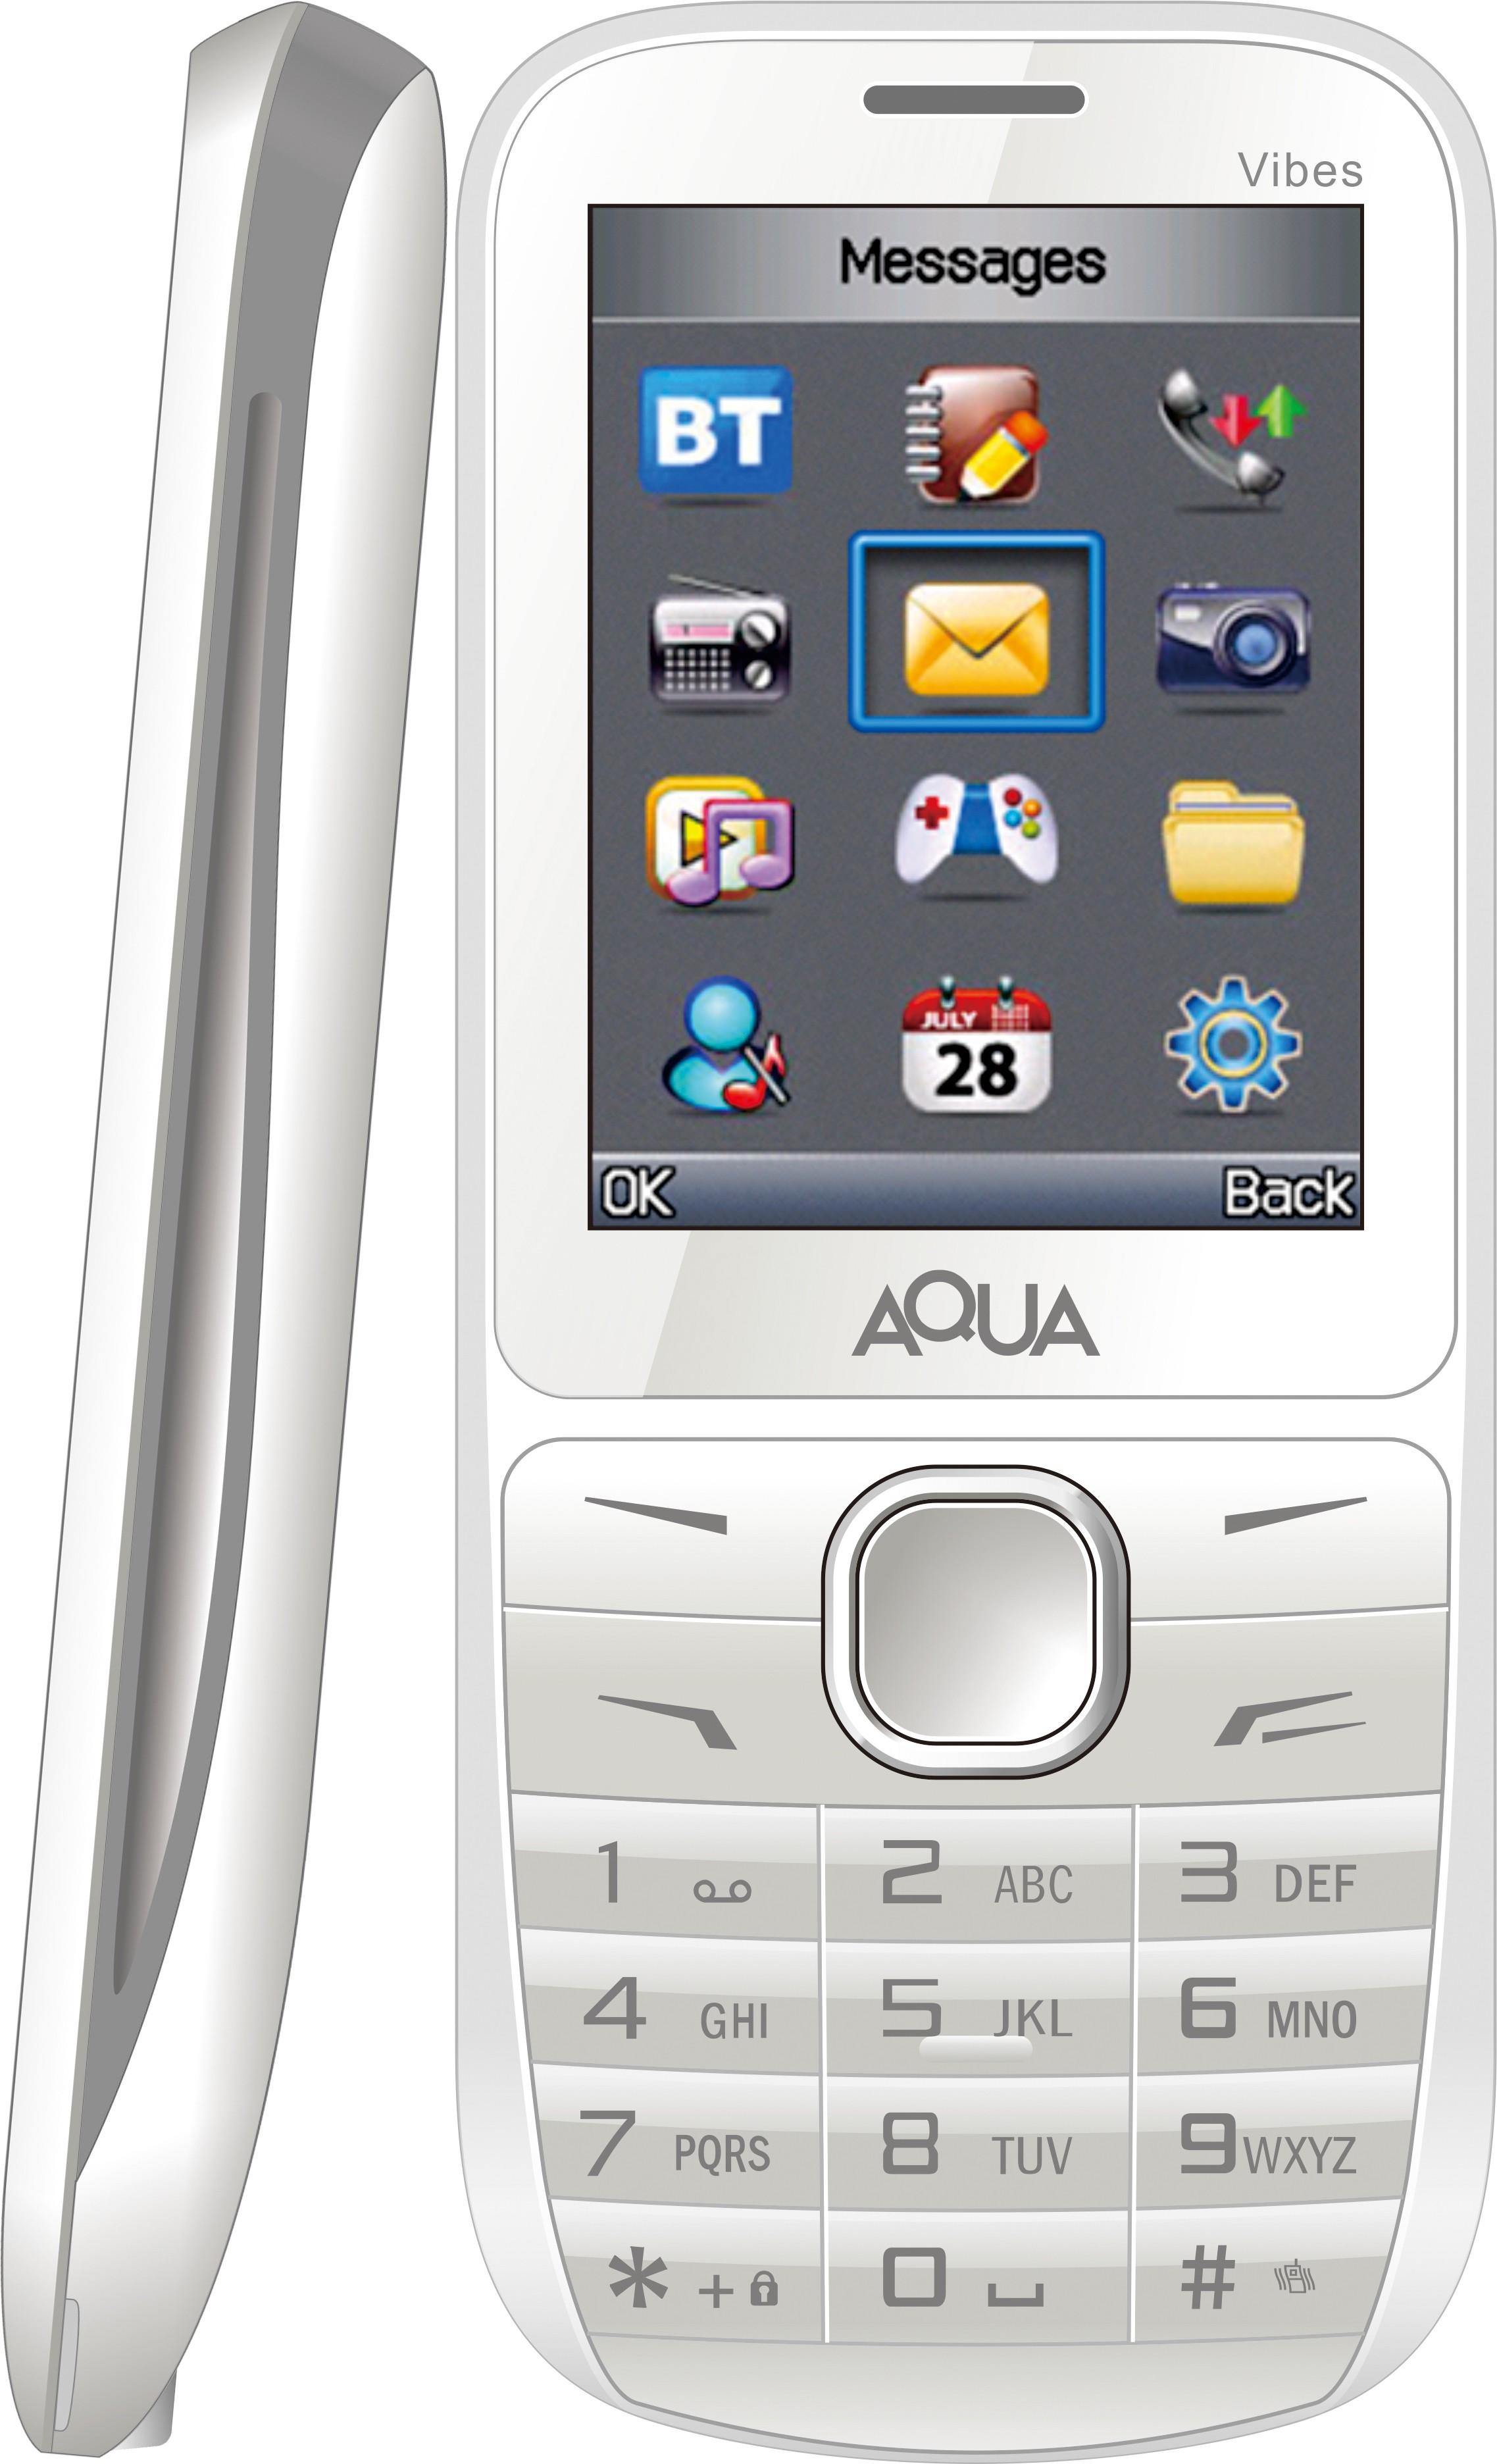 Aqua Vibes - Dual SIM Basic Mobile Phone(White, Grey)